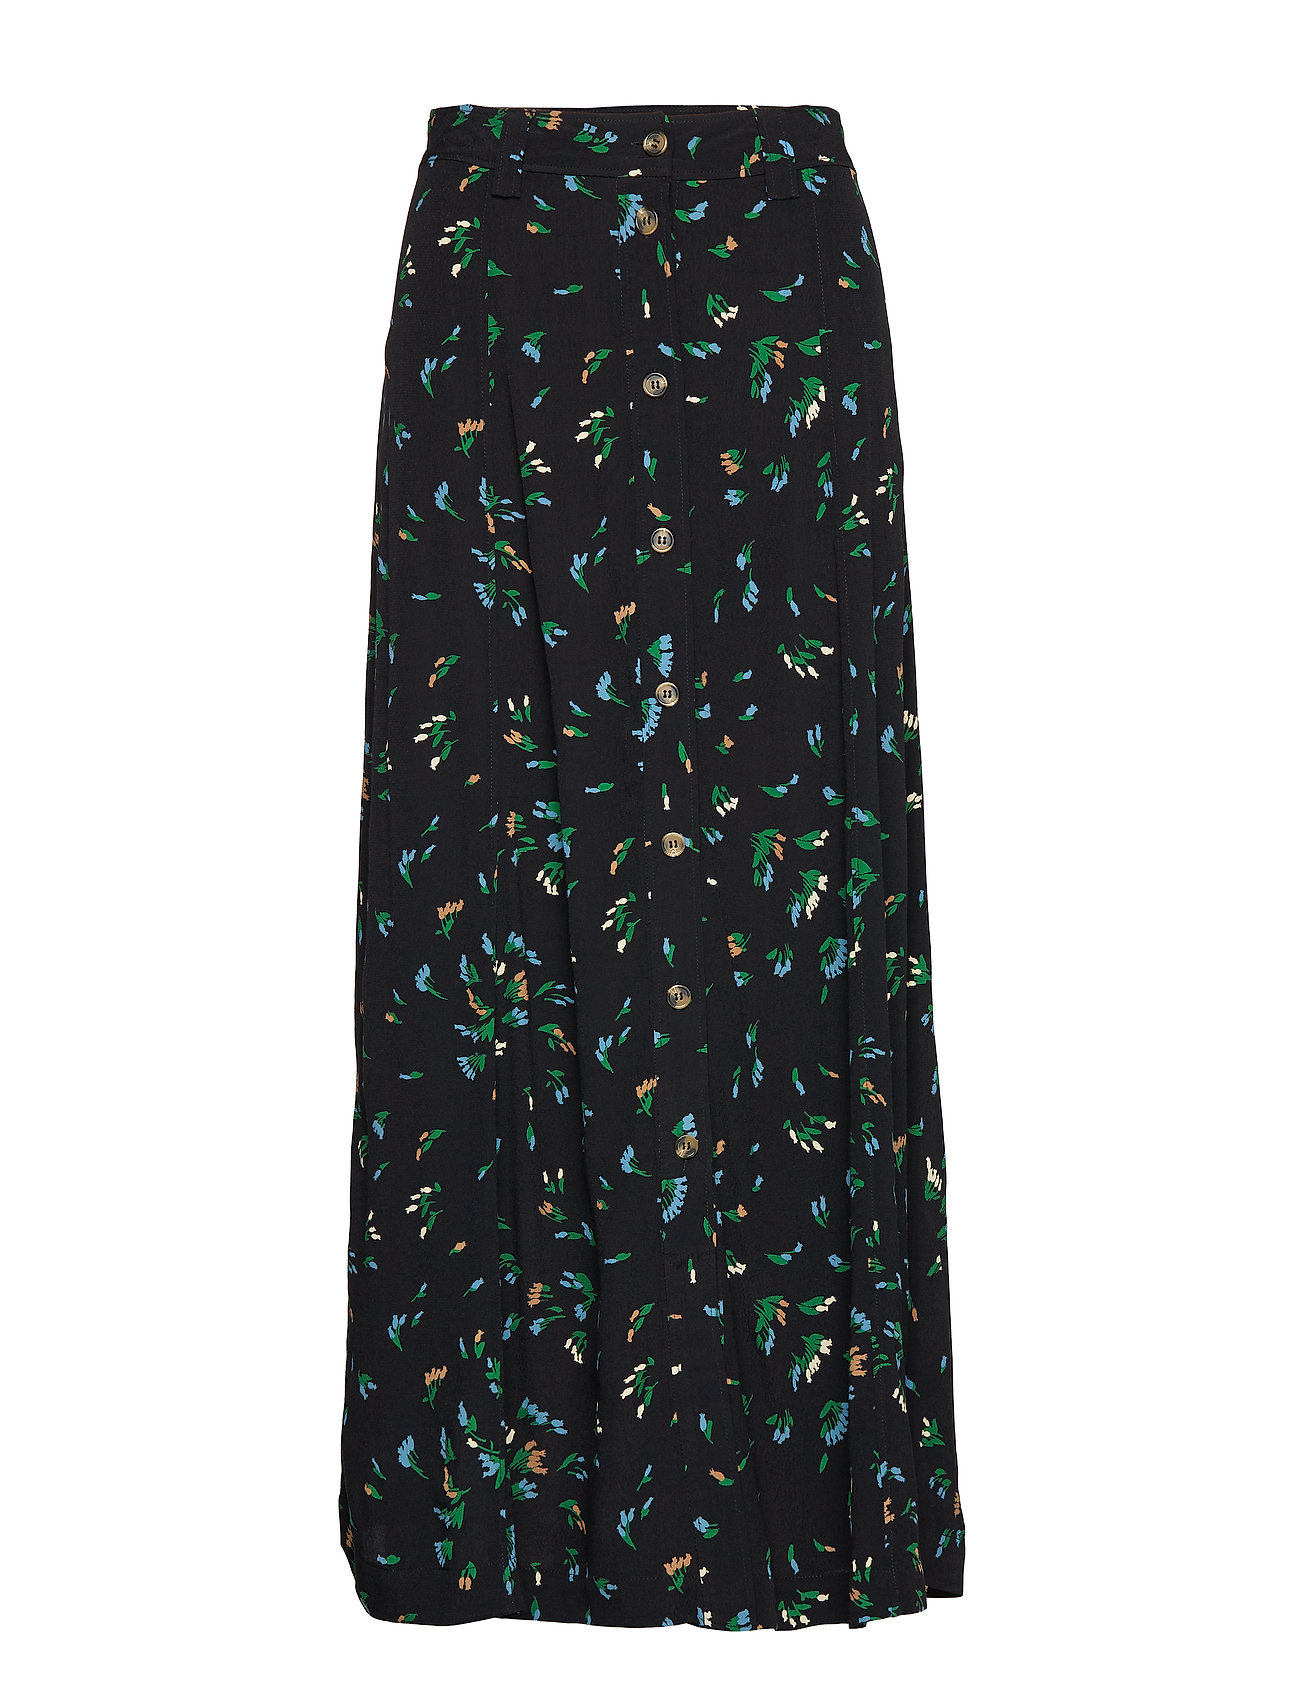 Ganni Printed Crepe Skirt - VERDANT GREEN